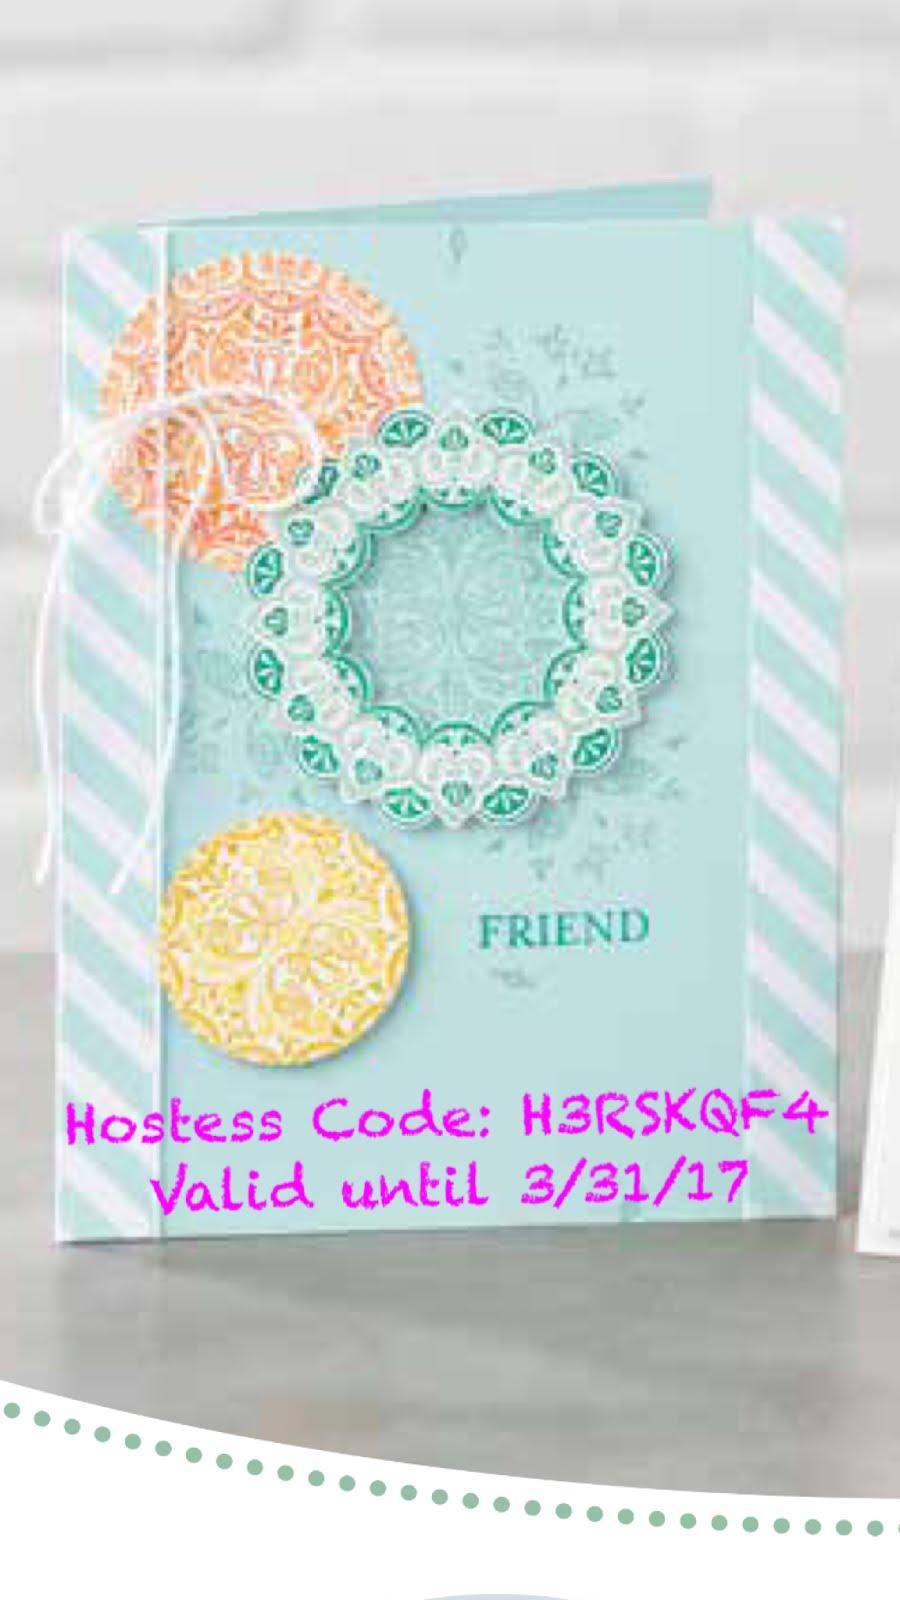 FINAL SAB17 Hostess Code